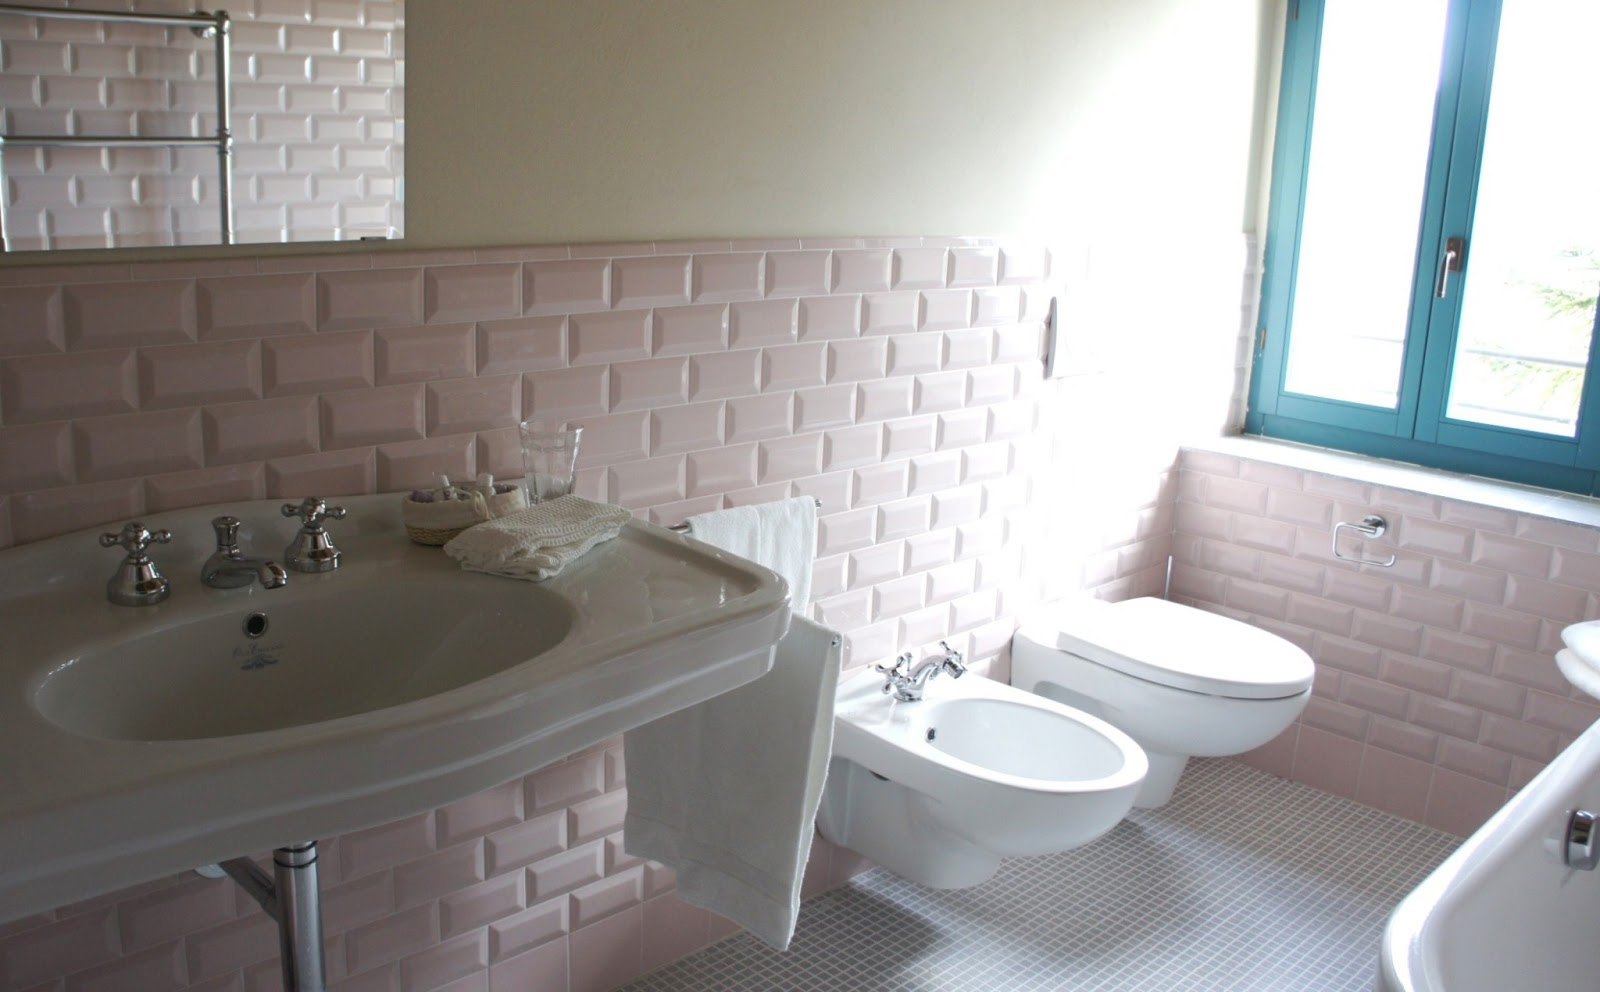 Bagno Con Mosaico Rosa : Piastrella mosaico rosa piastrelle rosa per bagno e camere ragno